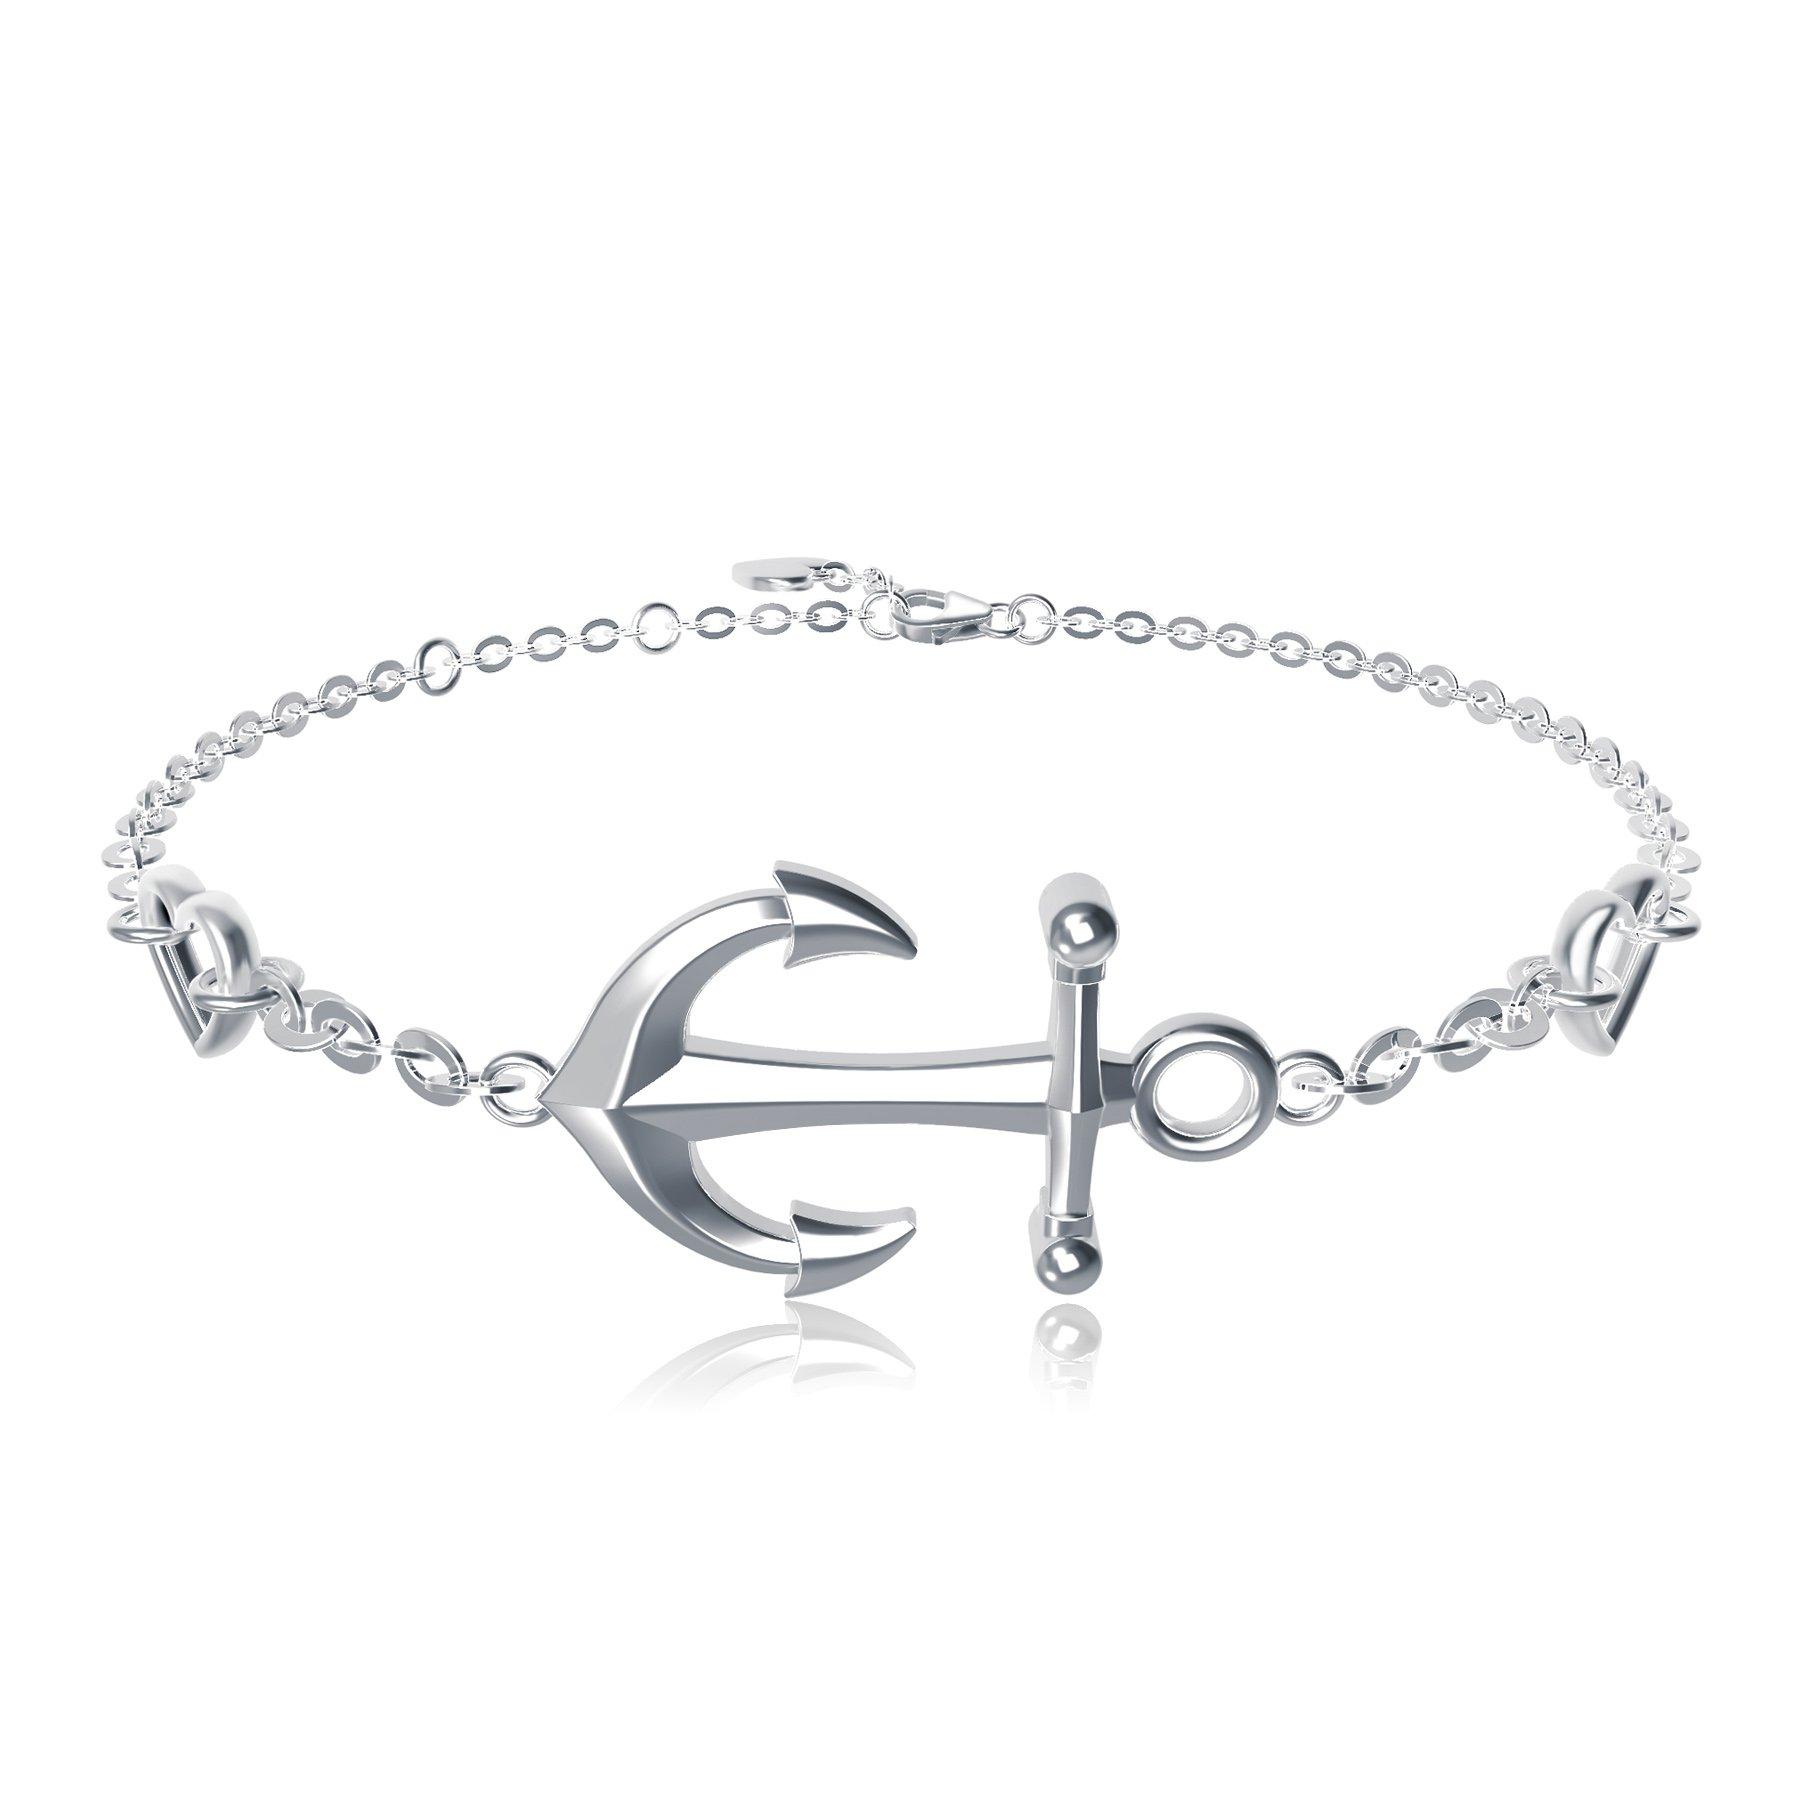 925 Sterling Silver Anchor Bracelet - Billie Bijoux White Gold Plated Diamond Charm Adjustable Bracelet